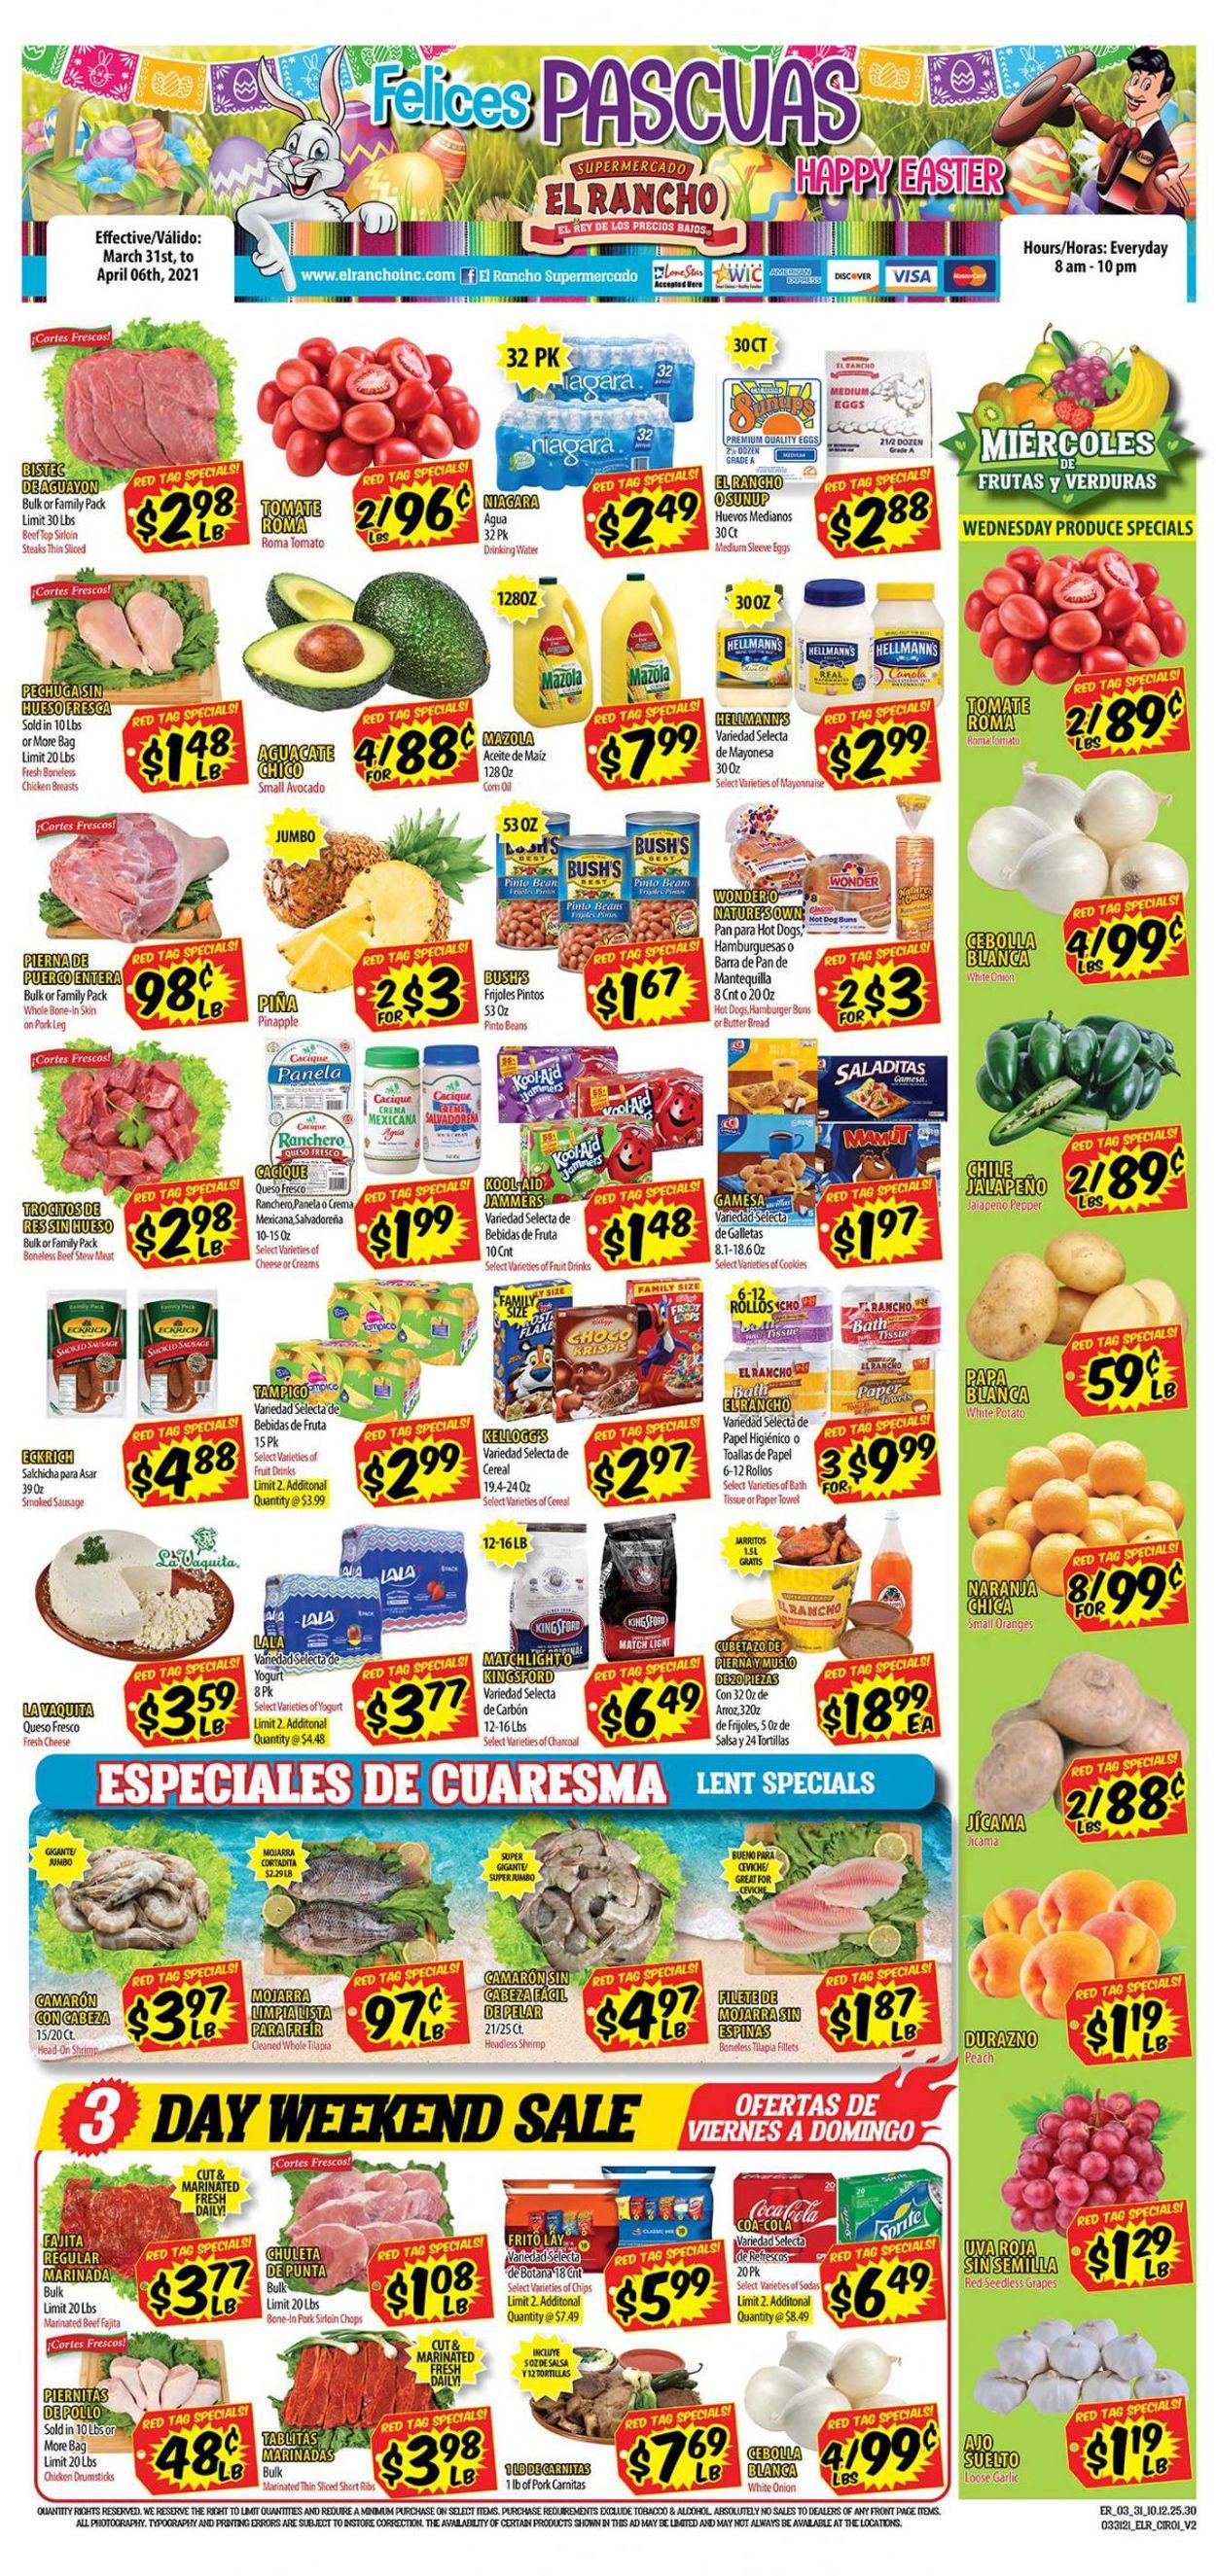 El Rancho Easter 2021 ad Weekly Ad Circular - valid 03/31-04/06/2021